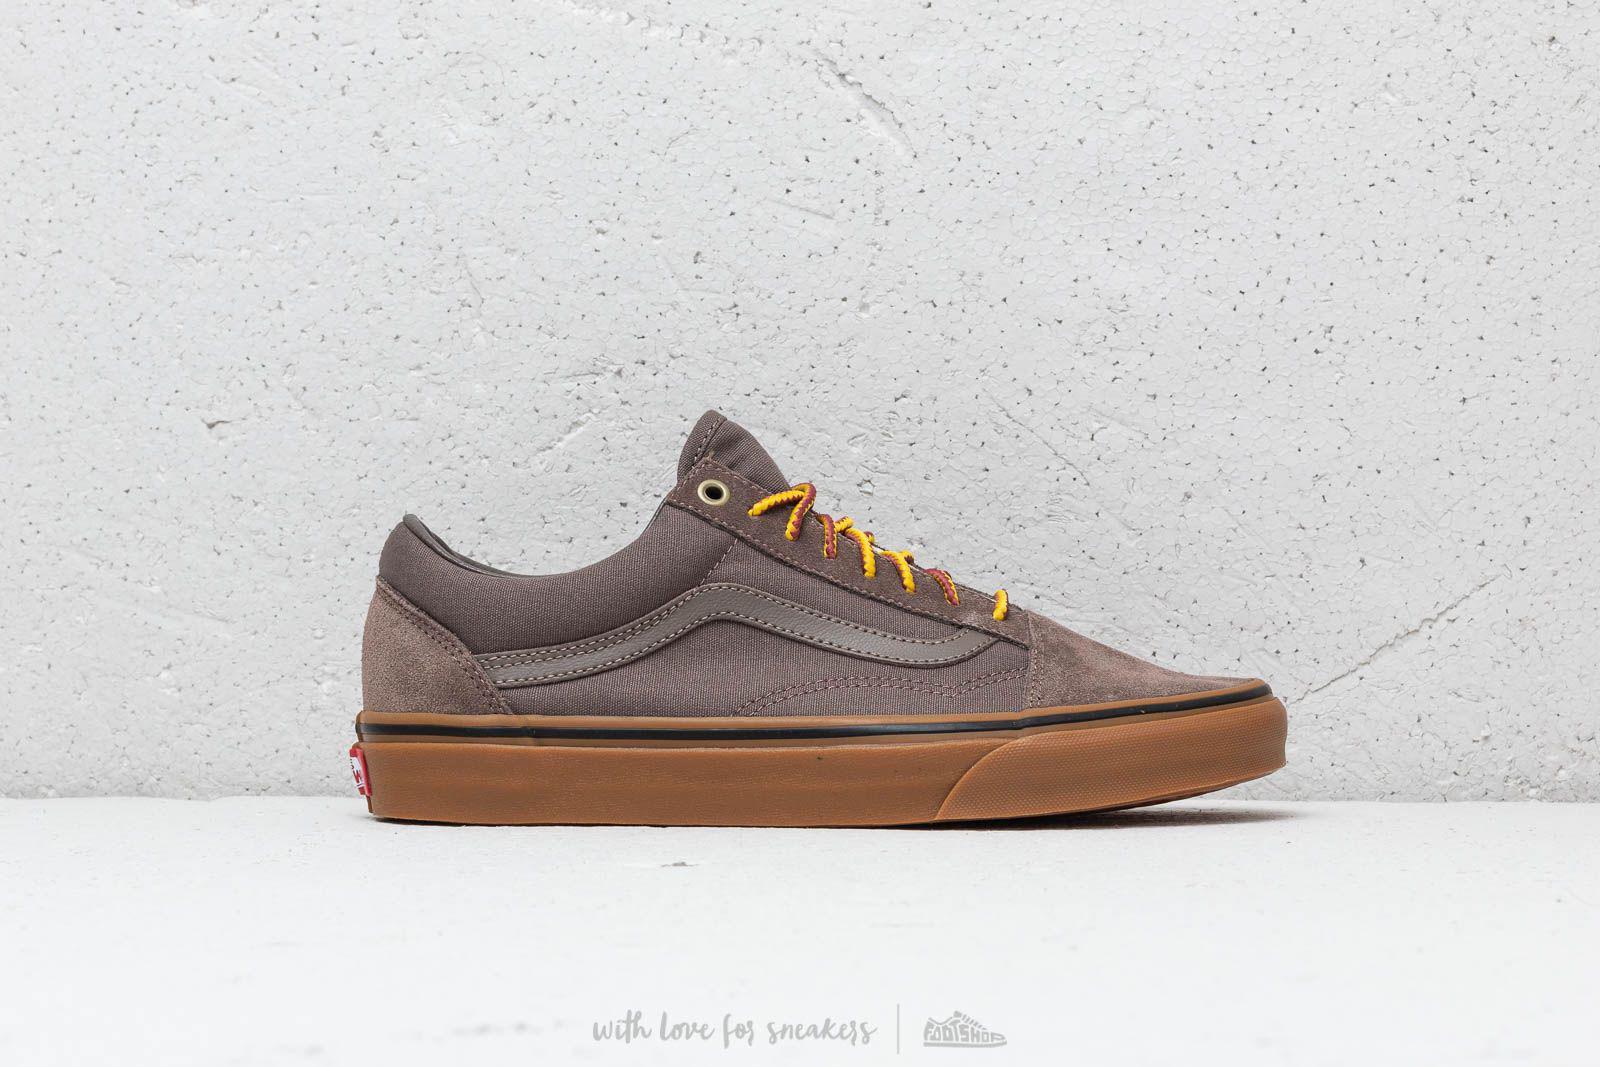 Chaussures Gumsole Old Skool Dentelle Vans pour homme - Lyst